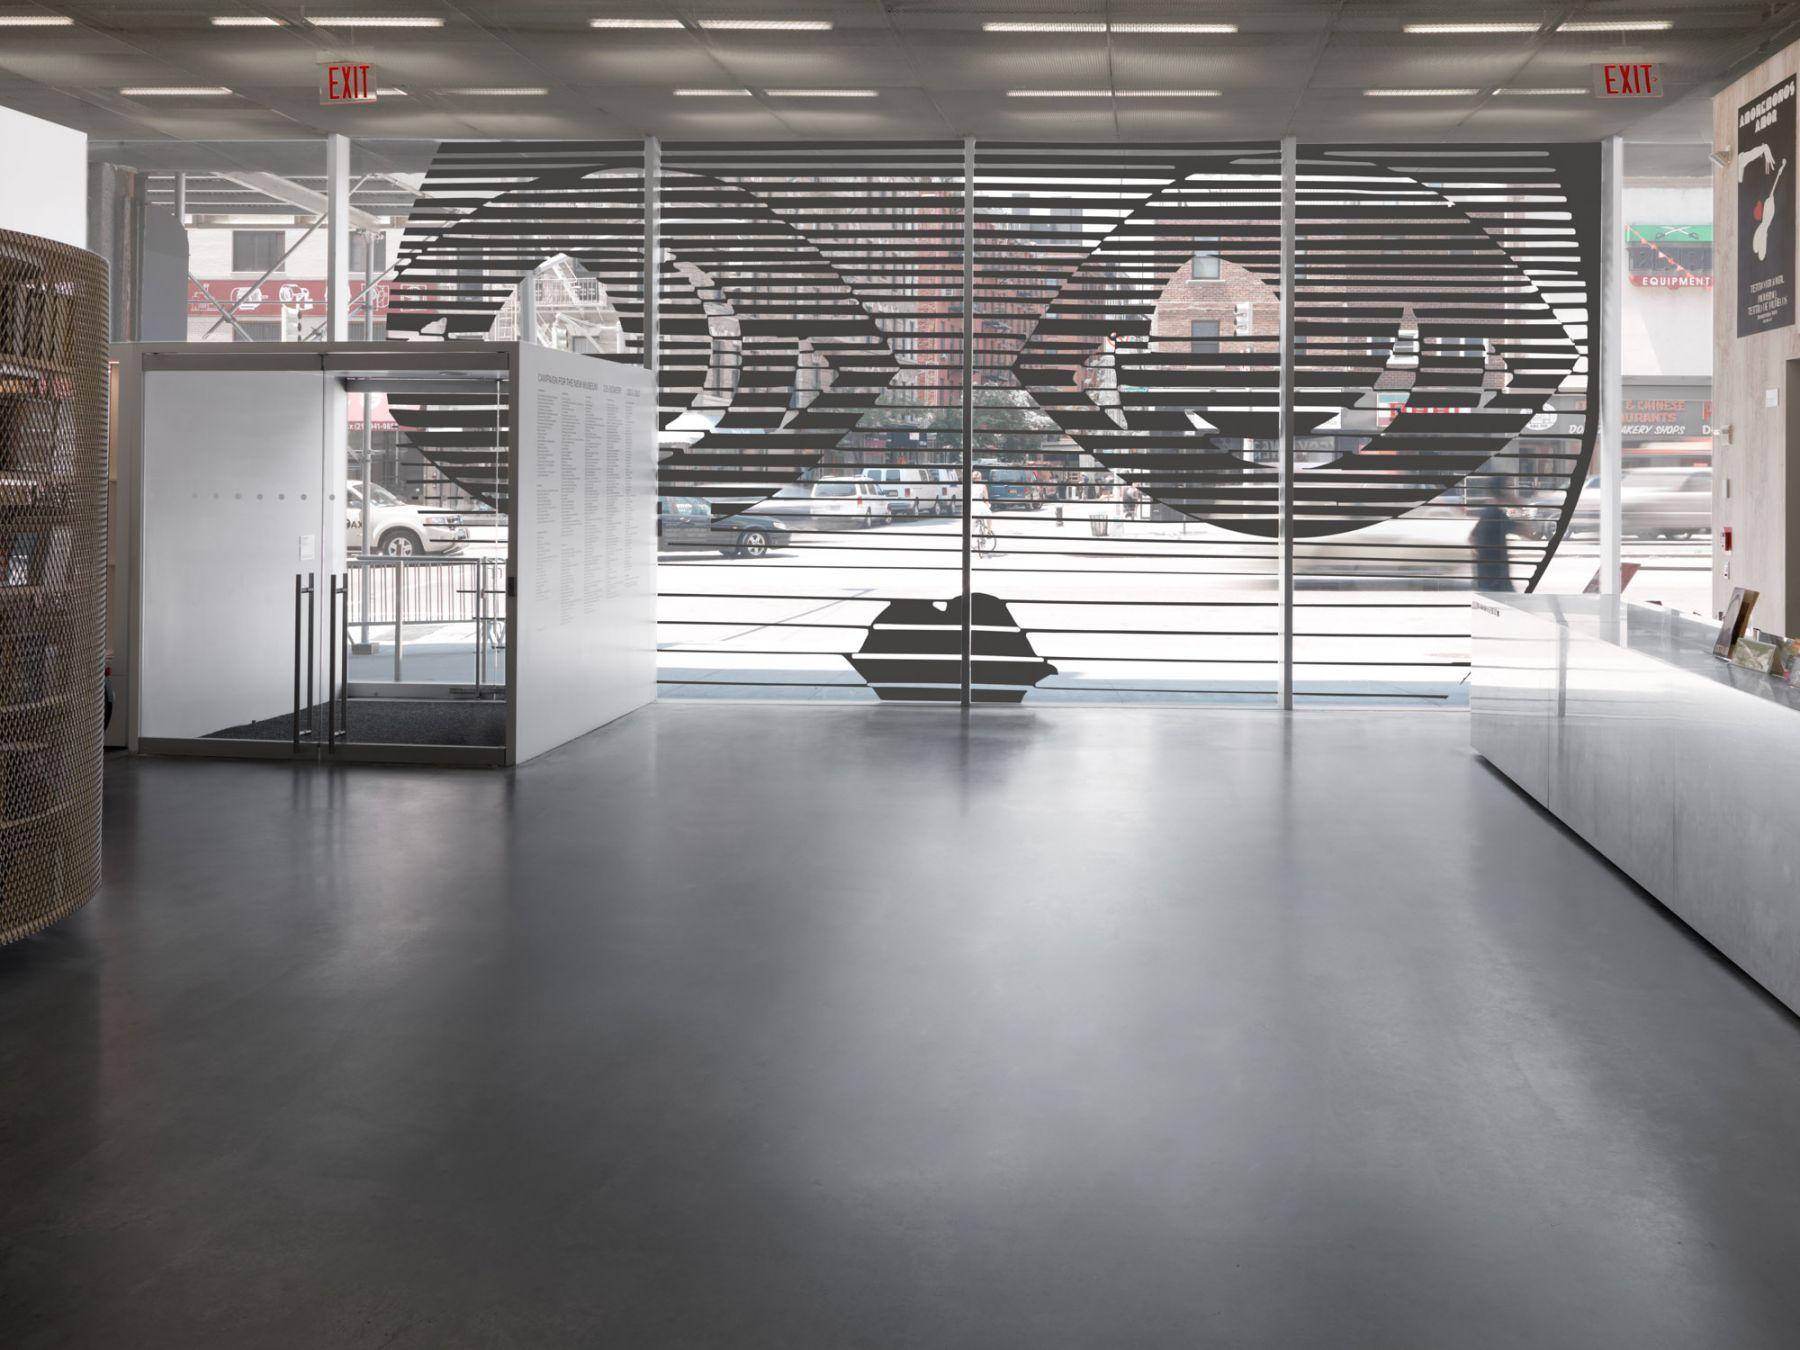 Ostalgia. Installation view, 2011. New Museum, New York. Photo: Chris Burke.